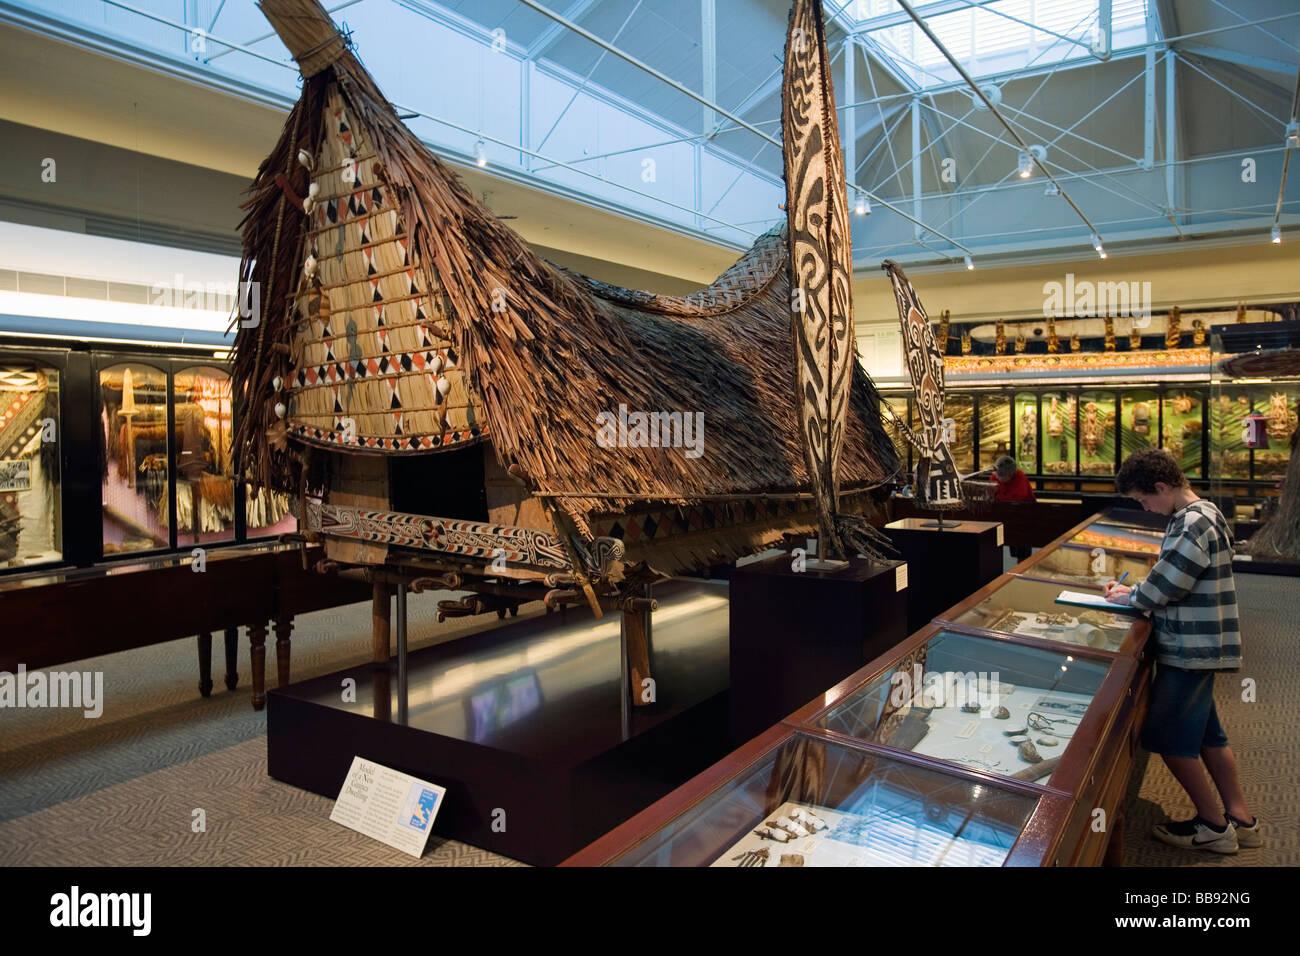 Pacific Culture Gallery nel South Australian Museum. Adelaide, South Australia, Australia Immagini Stock